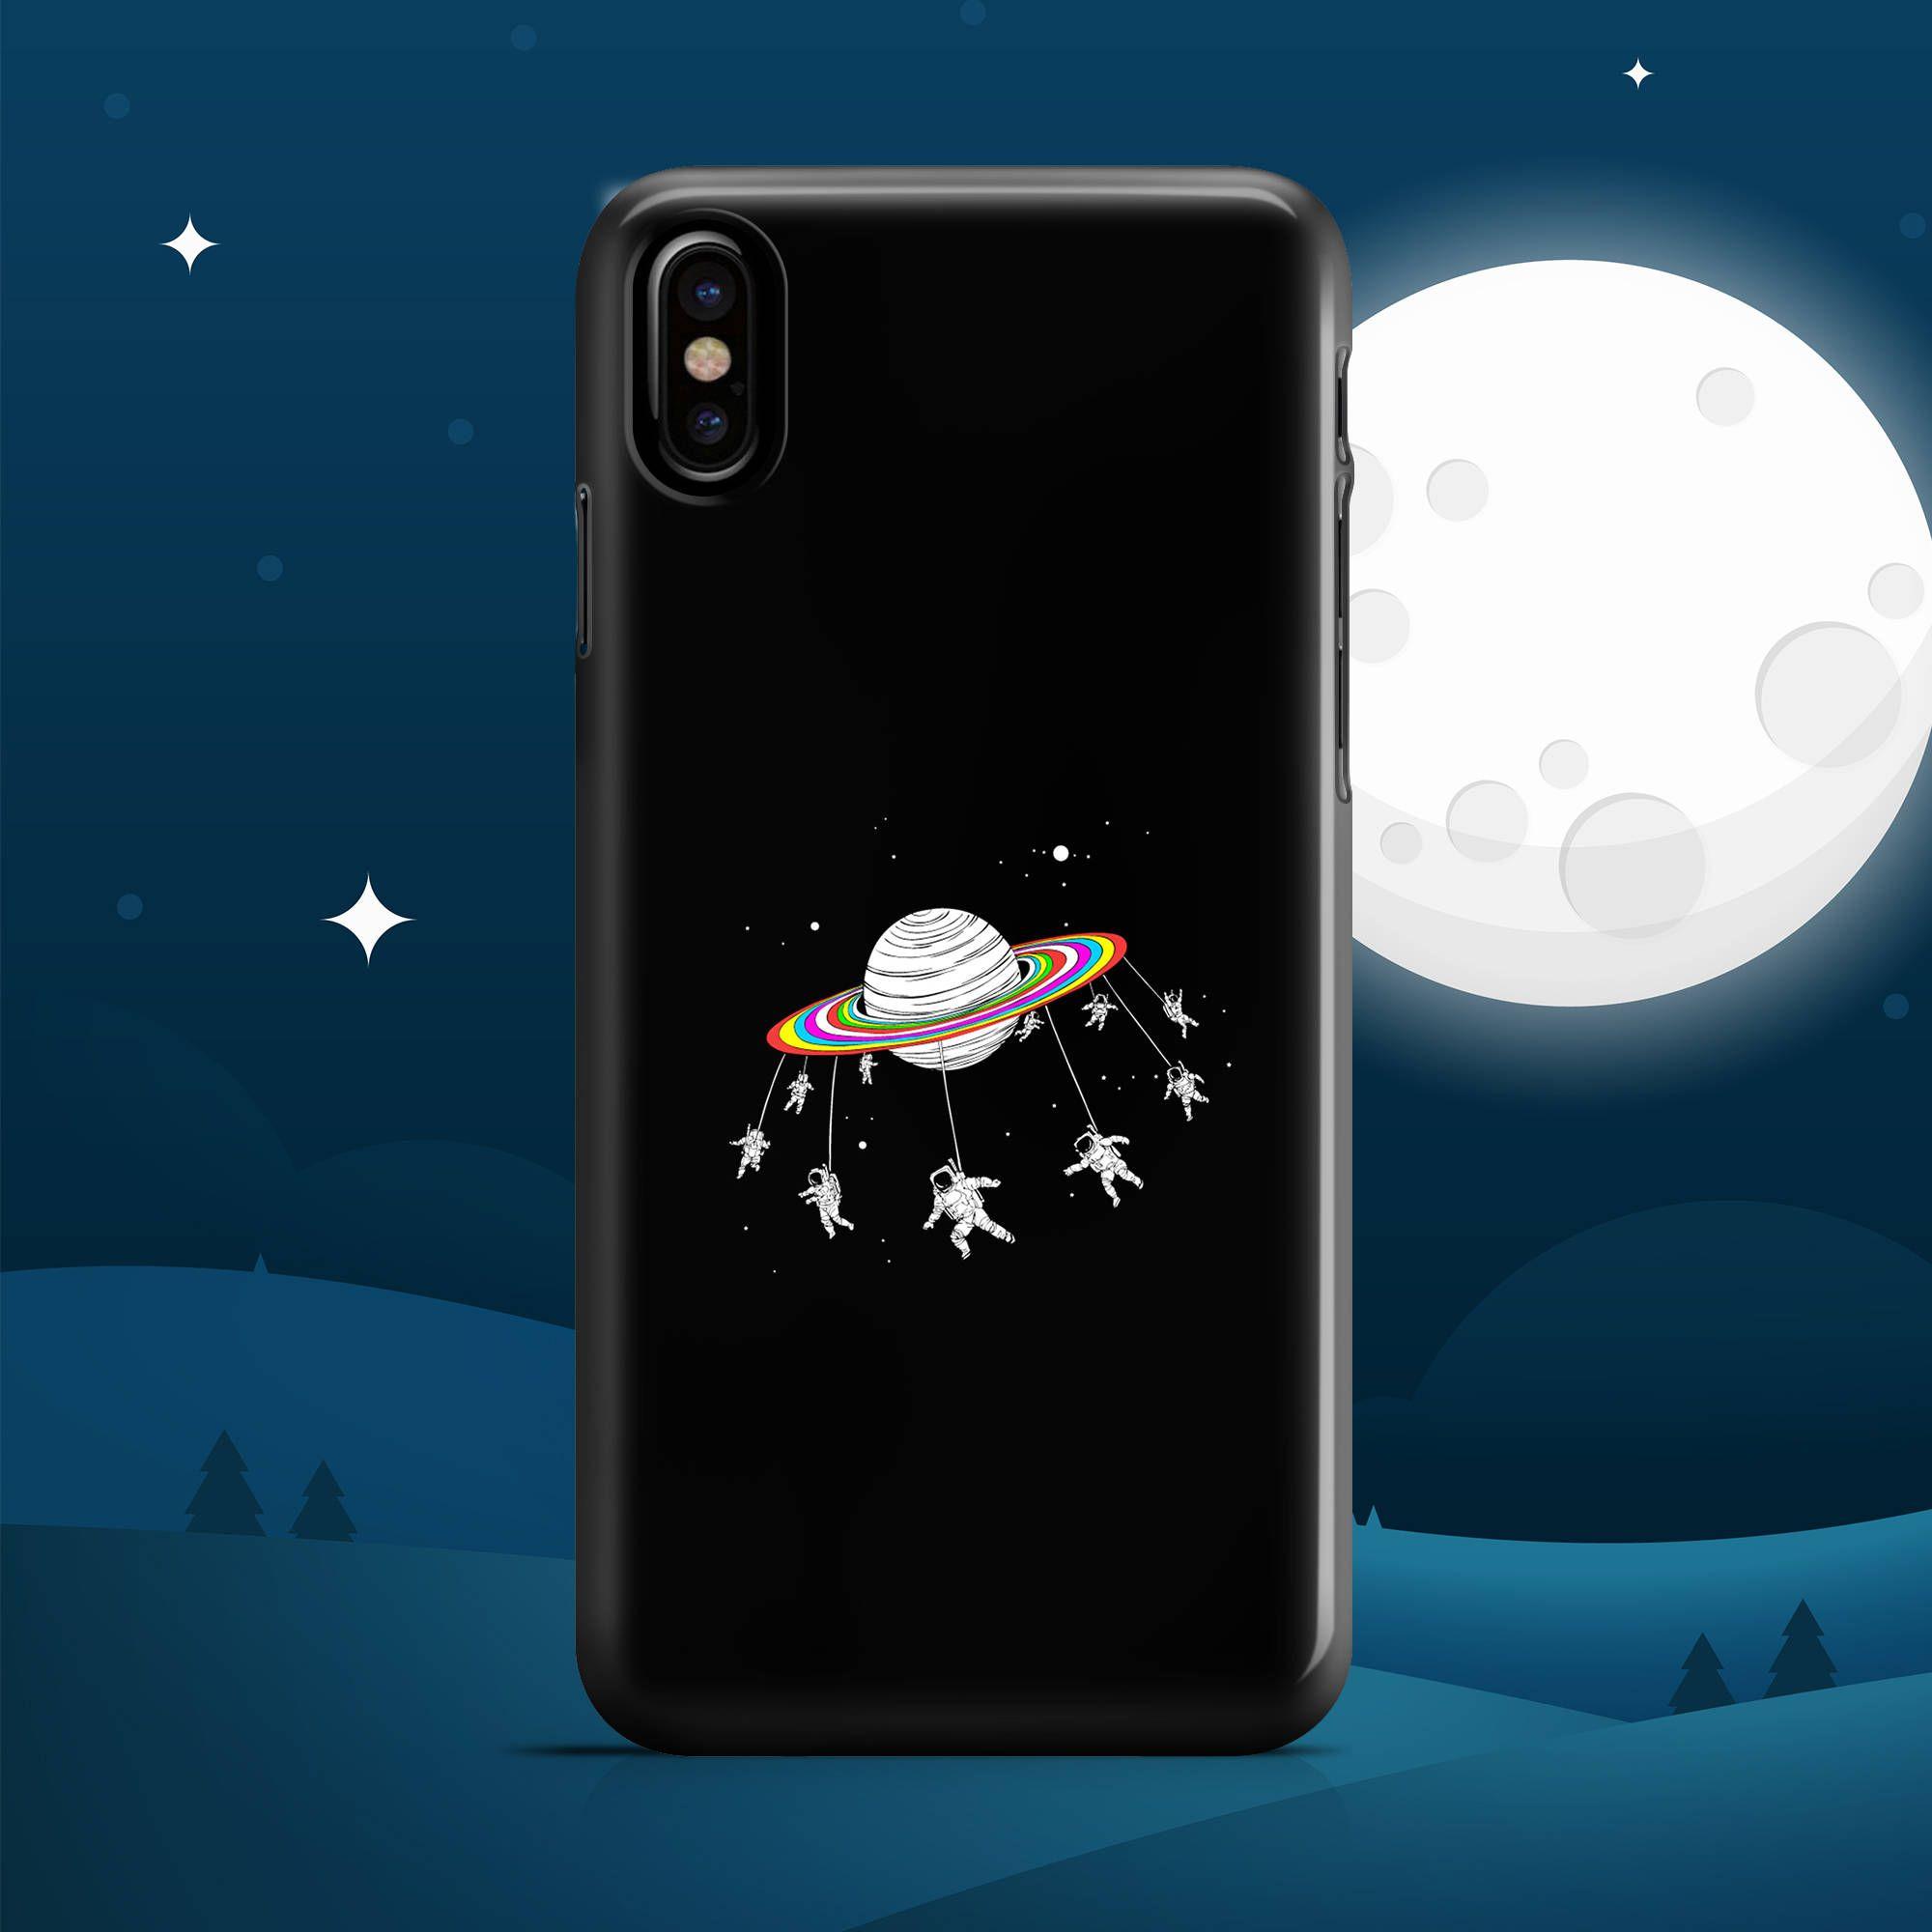 iphone x case swing ride saturn iphone 6 case iphone 7 case iphone 8 case iphone 8 plus case. Black Bedroom Furniture Sets. Home Design Ideas